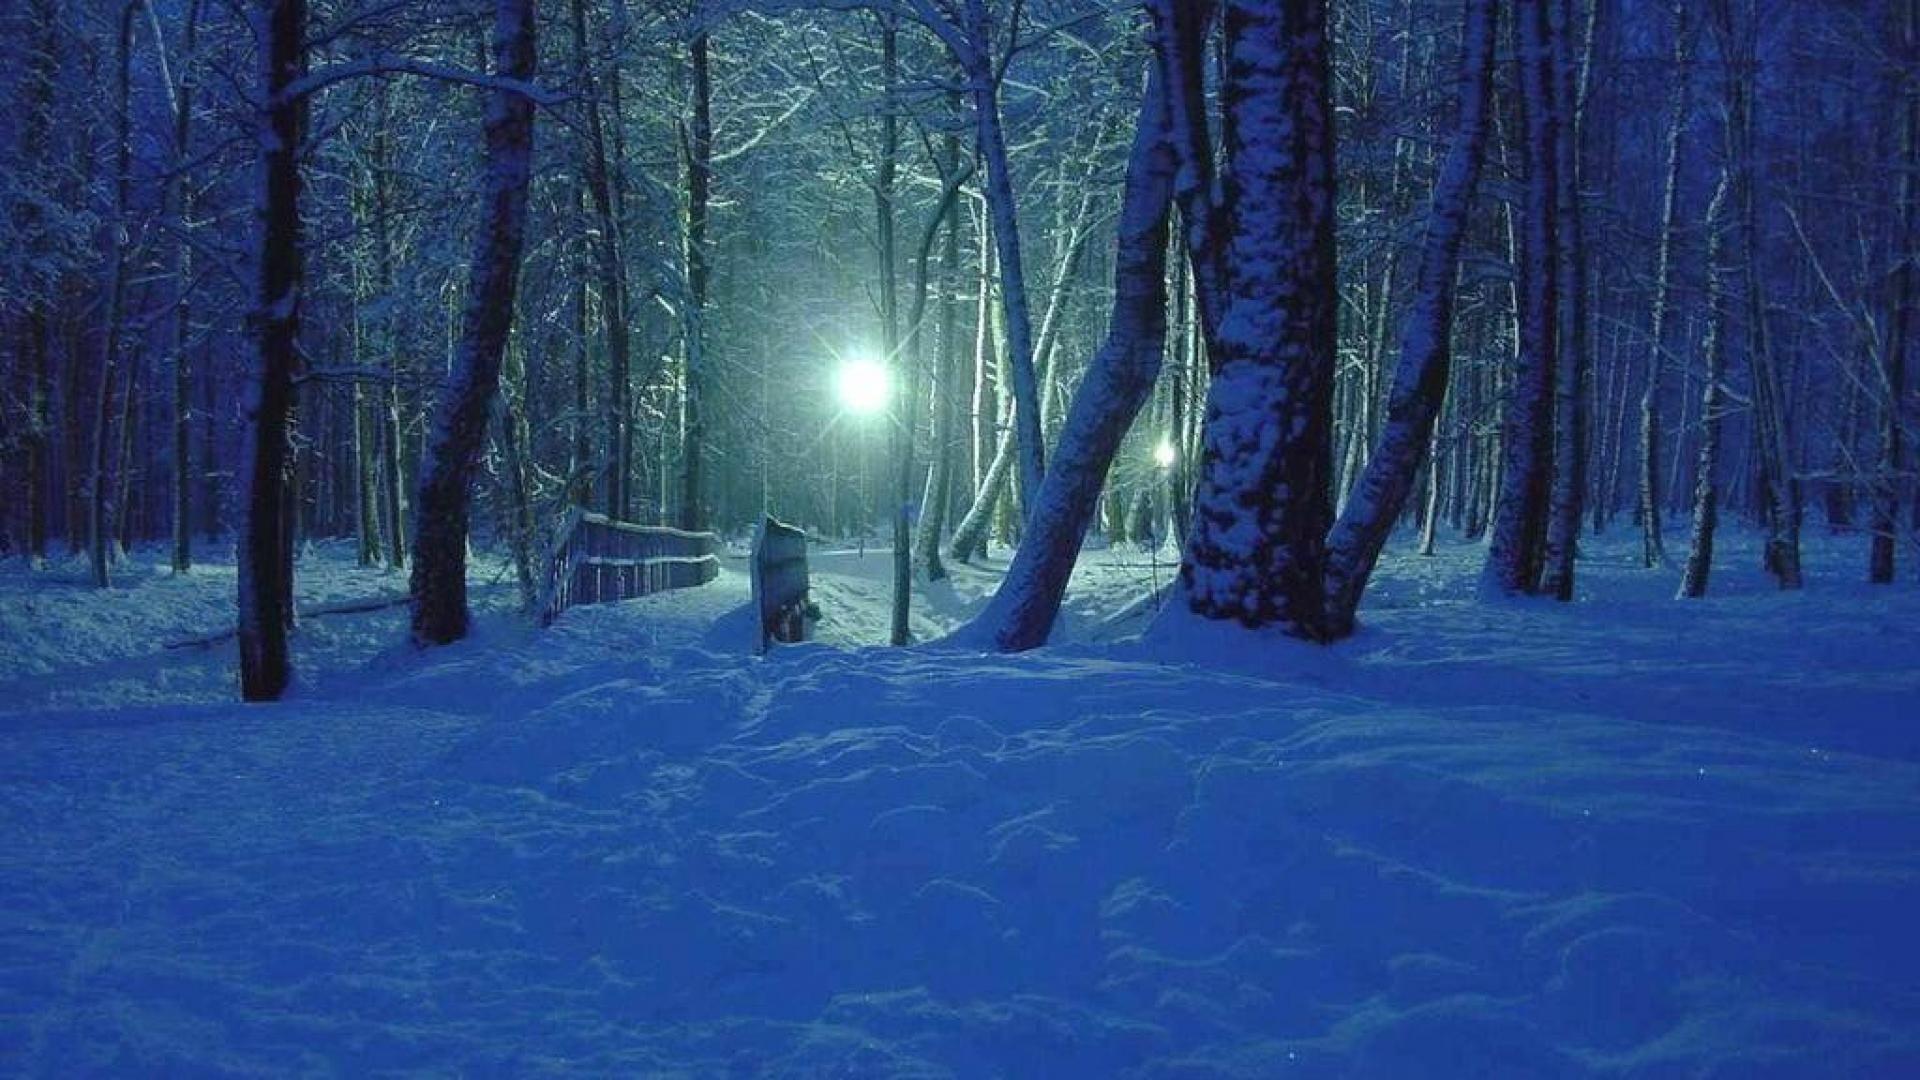 Winter Night Hd Desktop Background wallpapers HD free - 497448 | Night  landscape, Winter forest, Dark forest